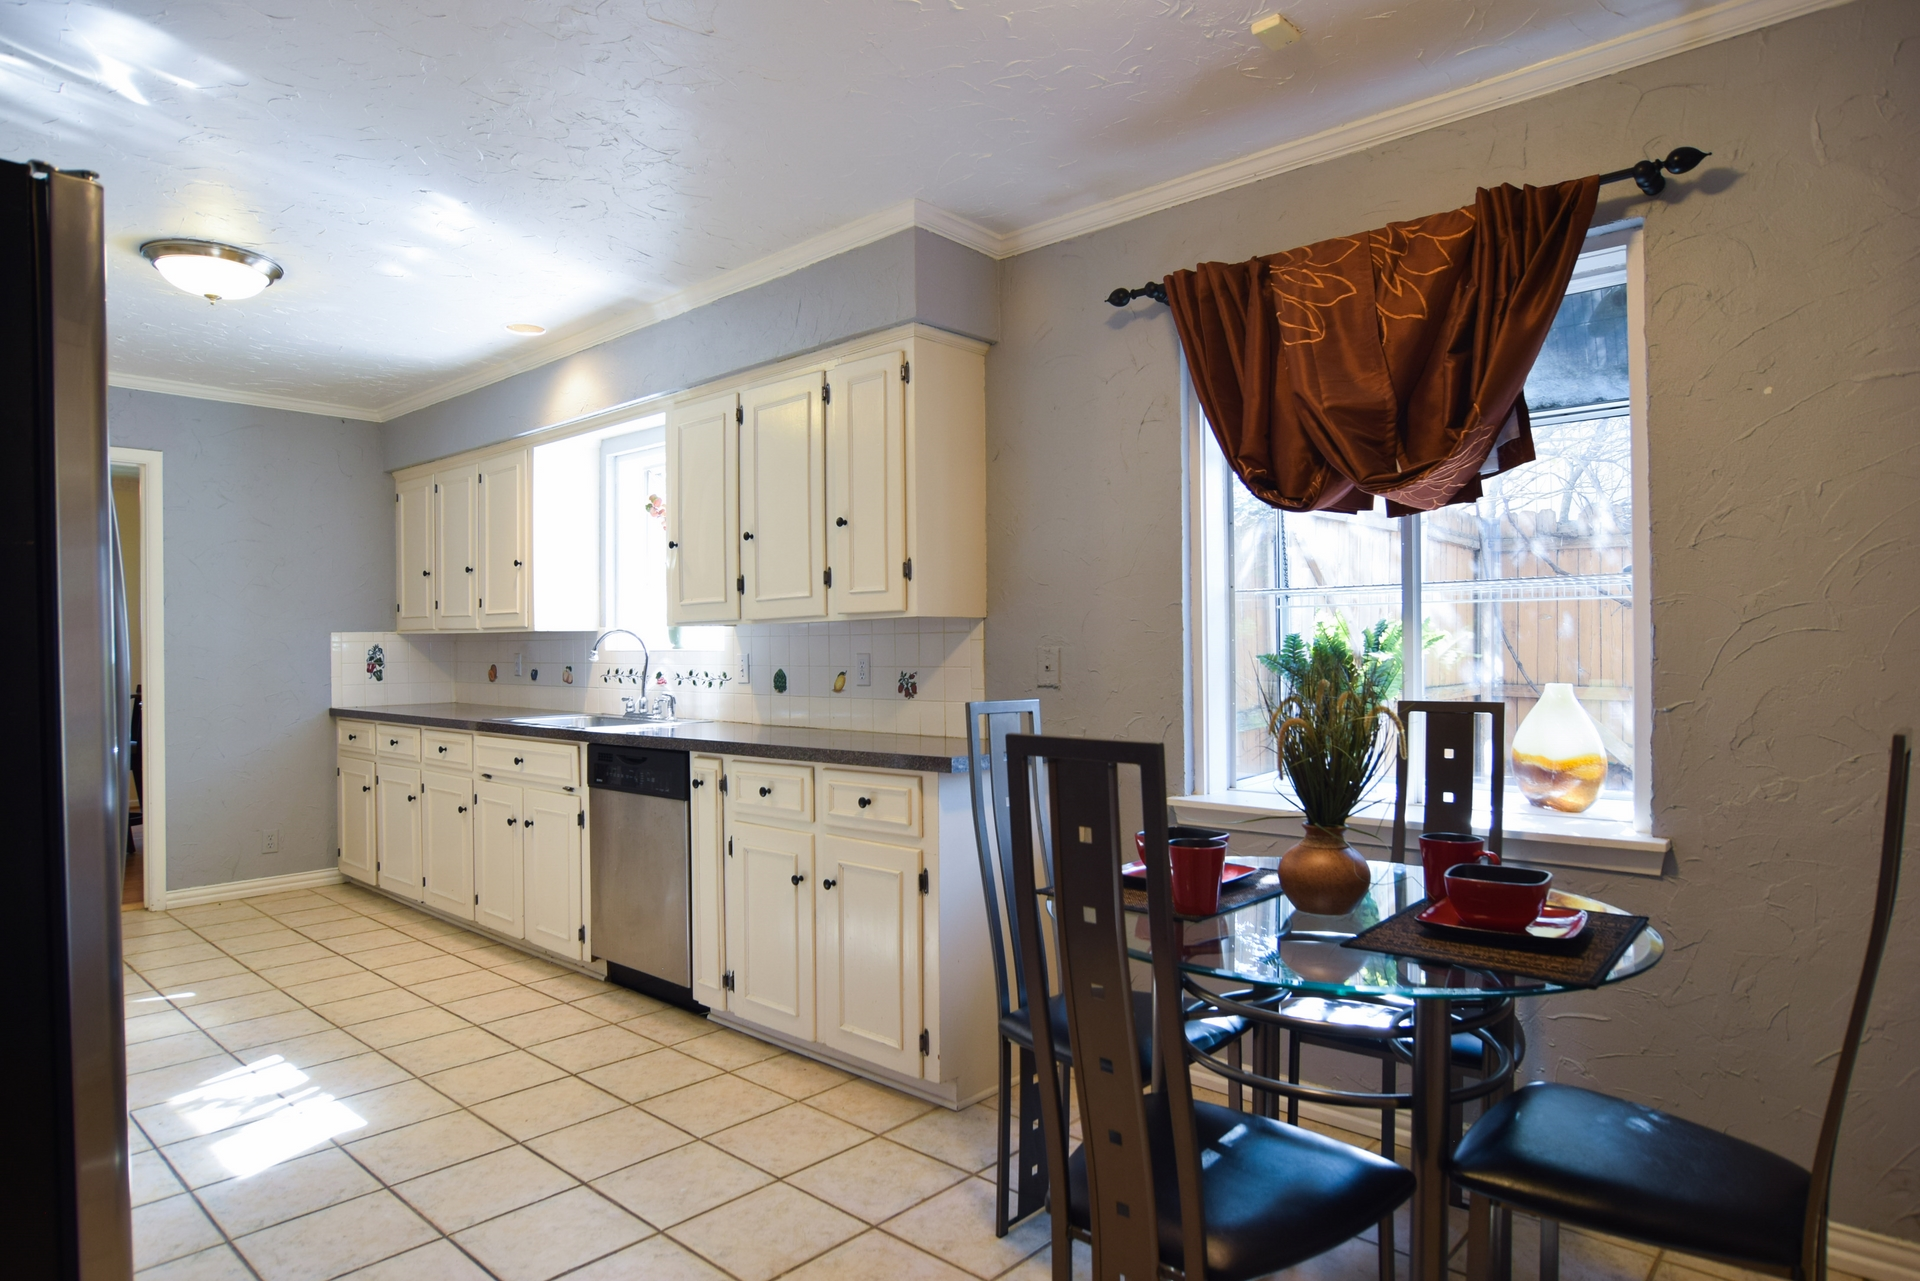 Breakfast Area 3235 Timberview Rd Dallas TX 75229.jpg